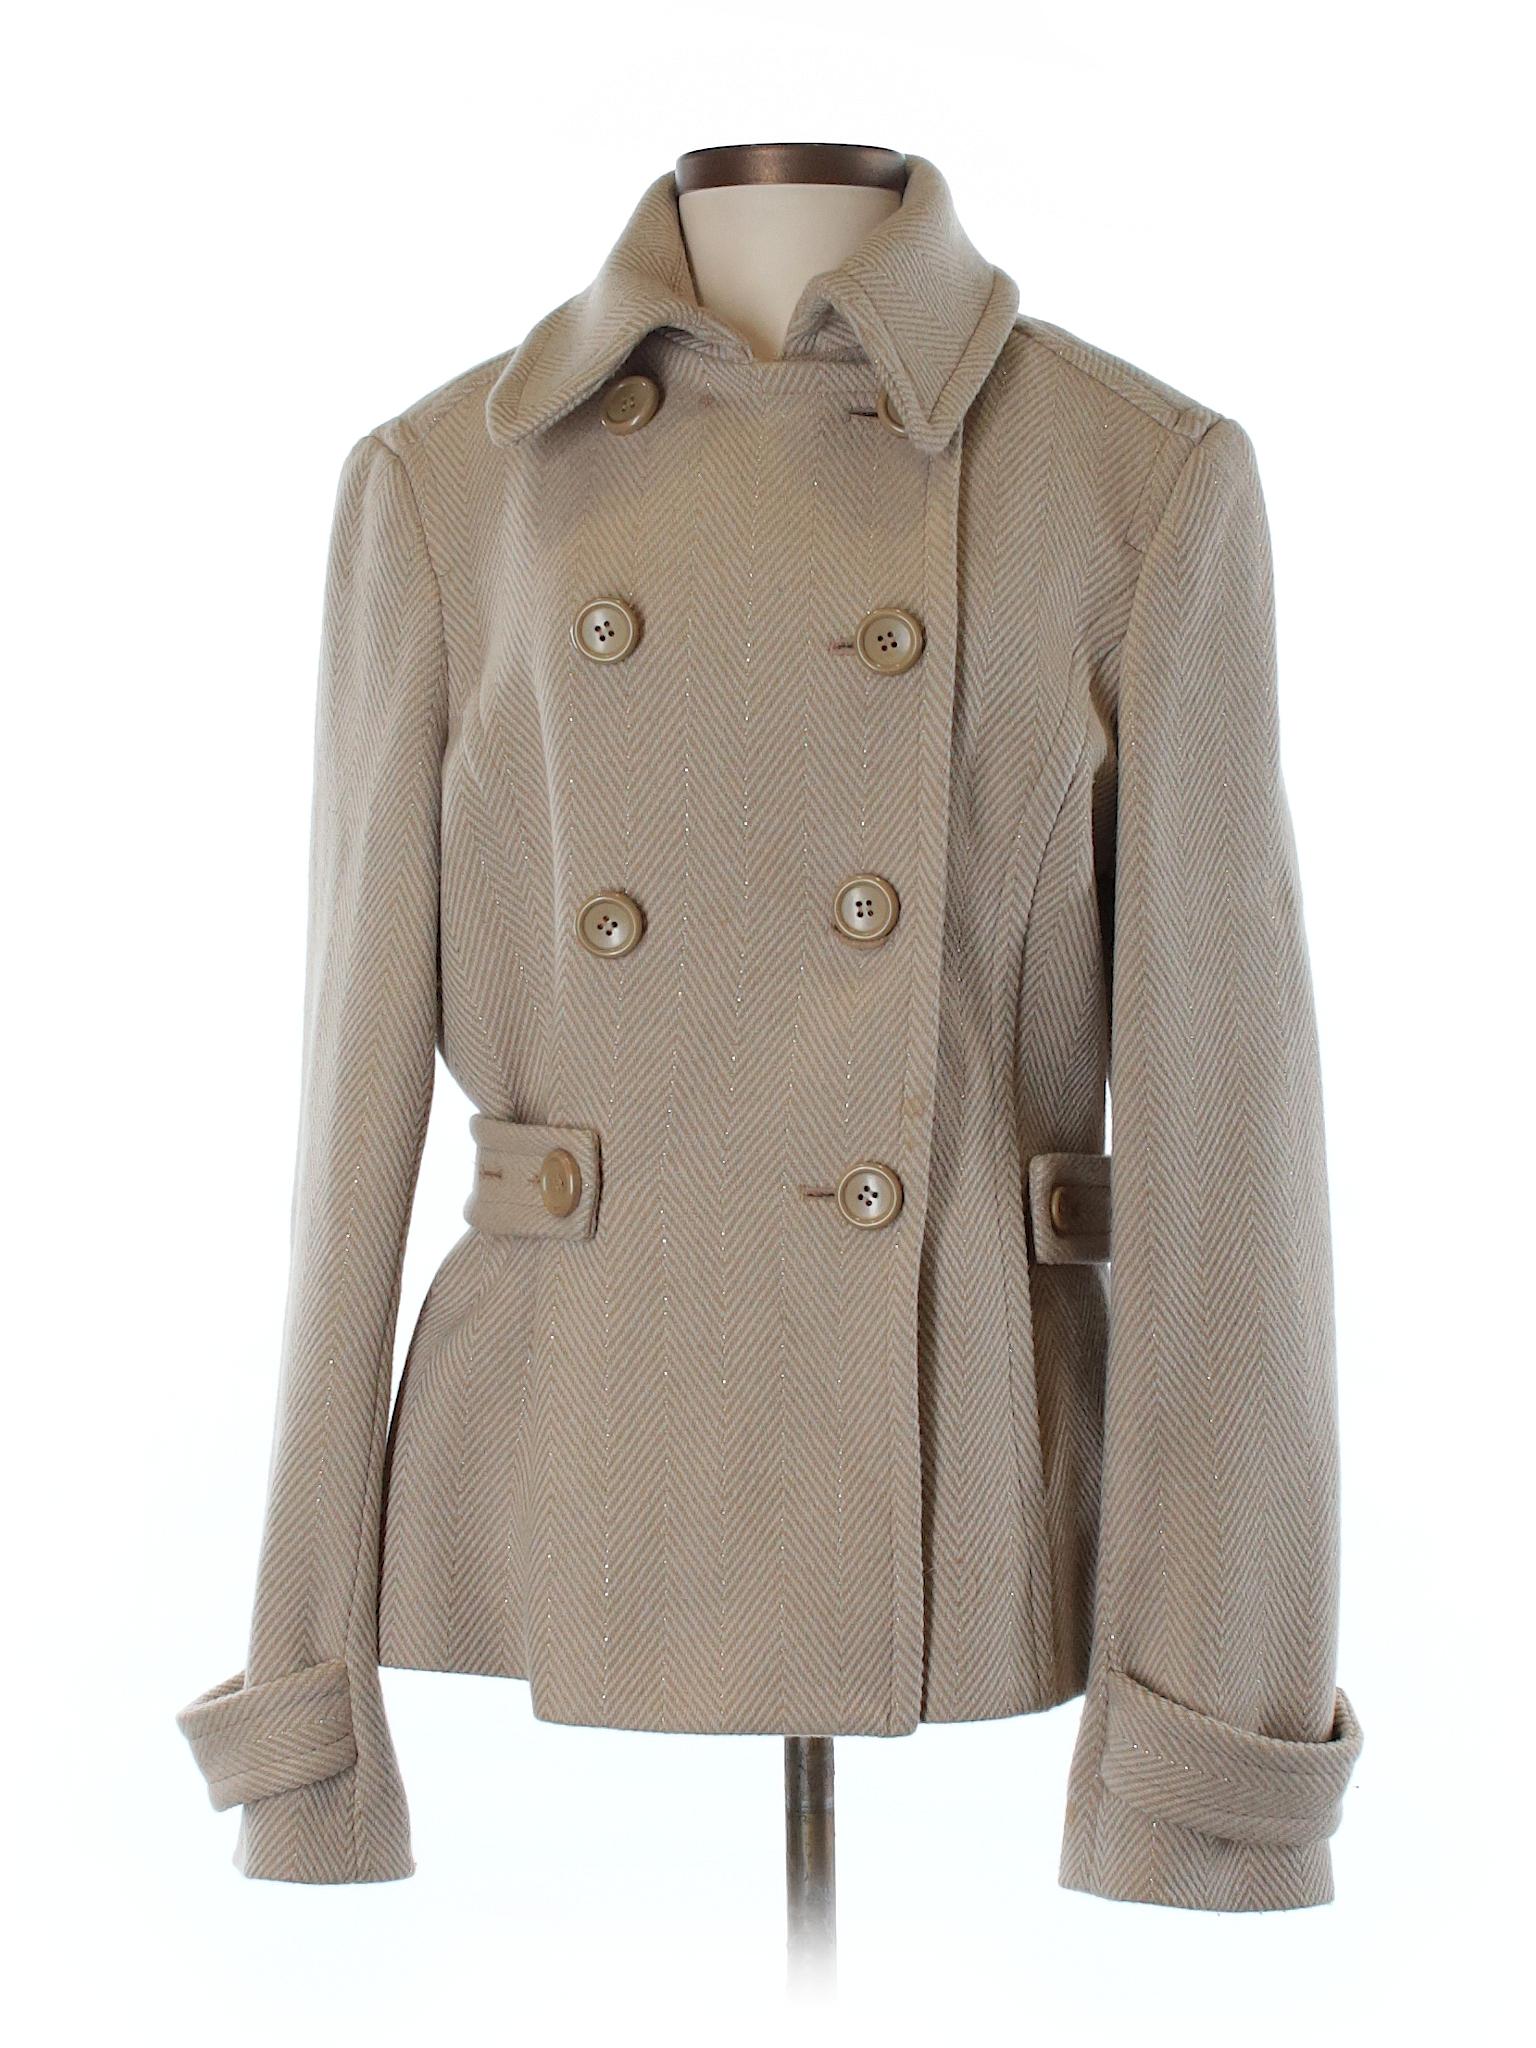 Express Design Studio Coat Wool